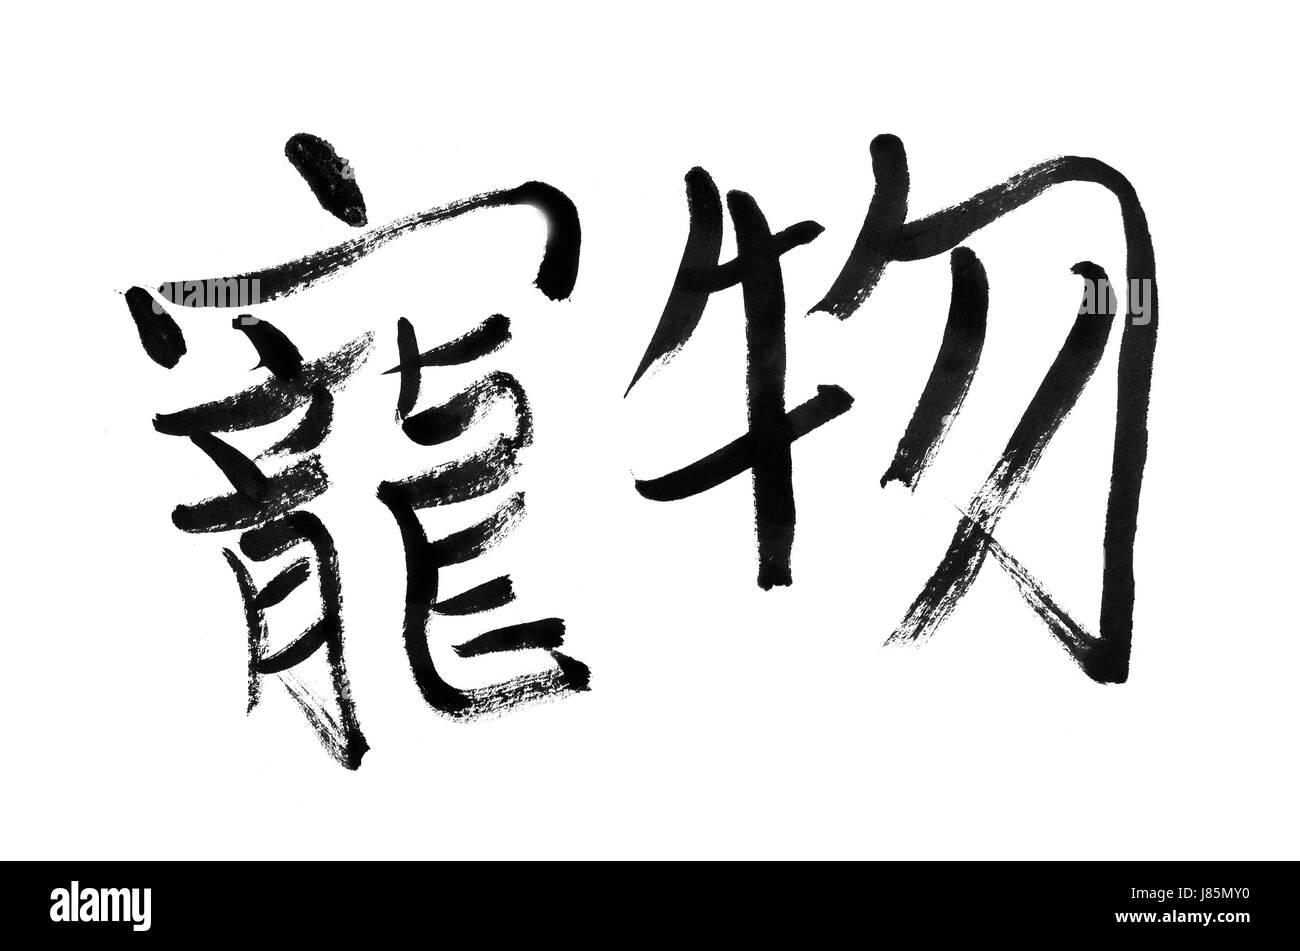 pet traditional oriental darling handwriting favourite write wrote writing - Stock Image